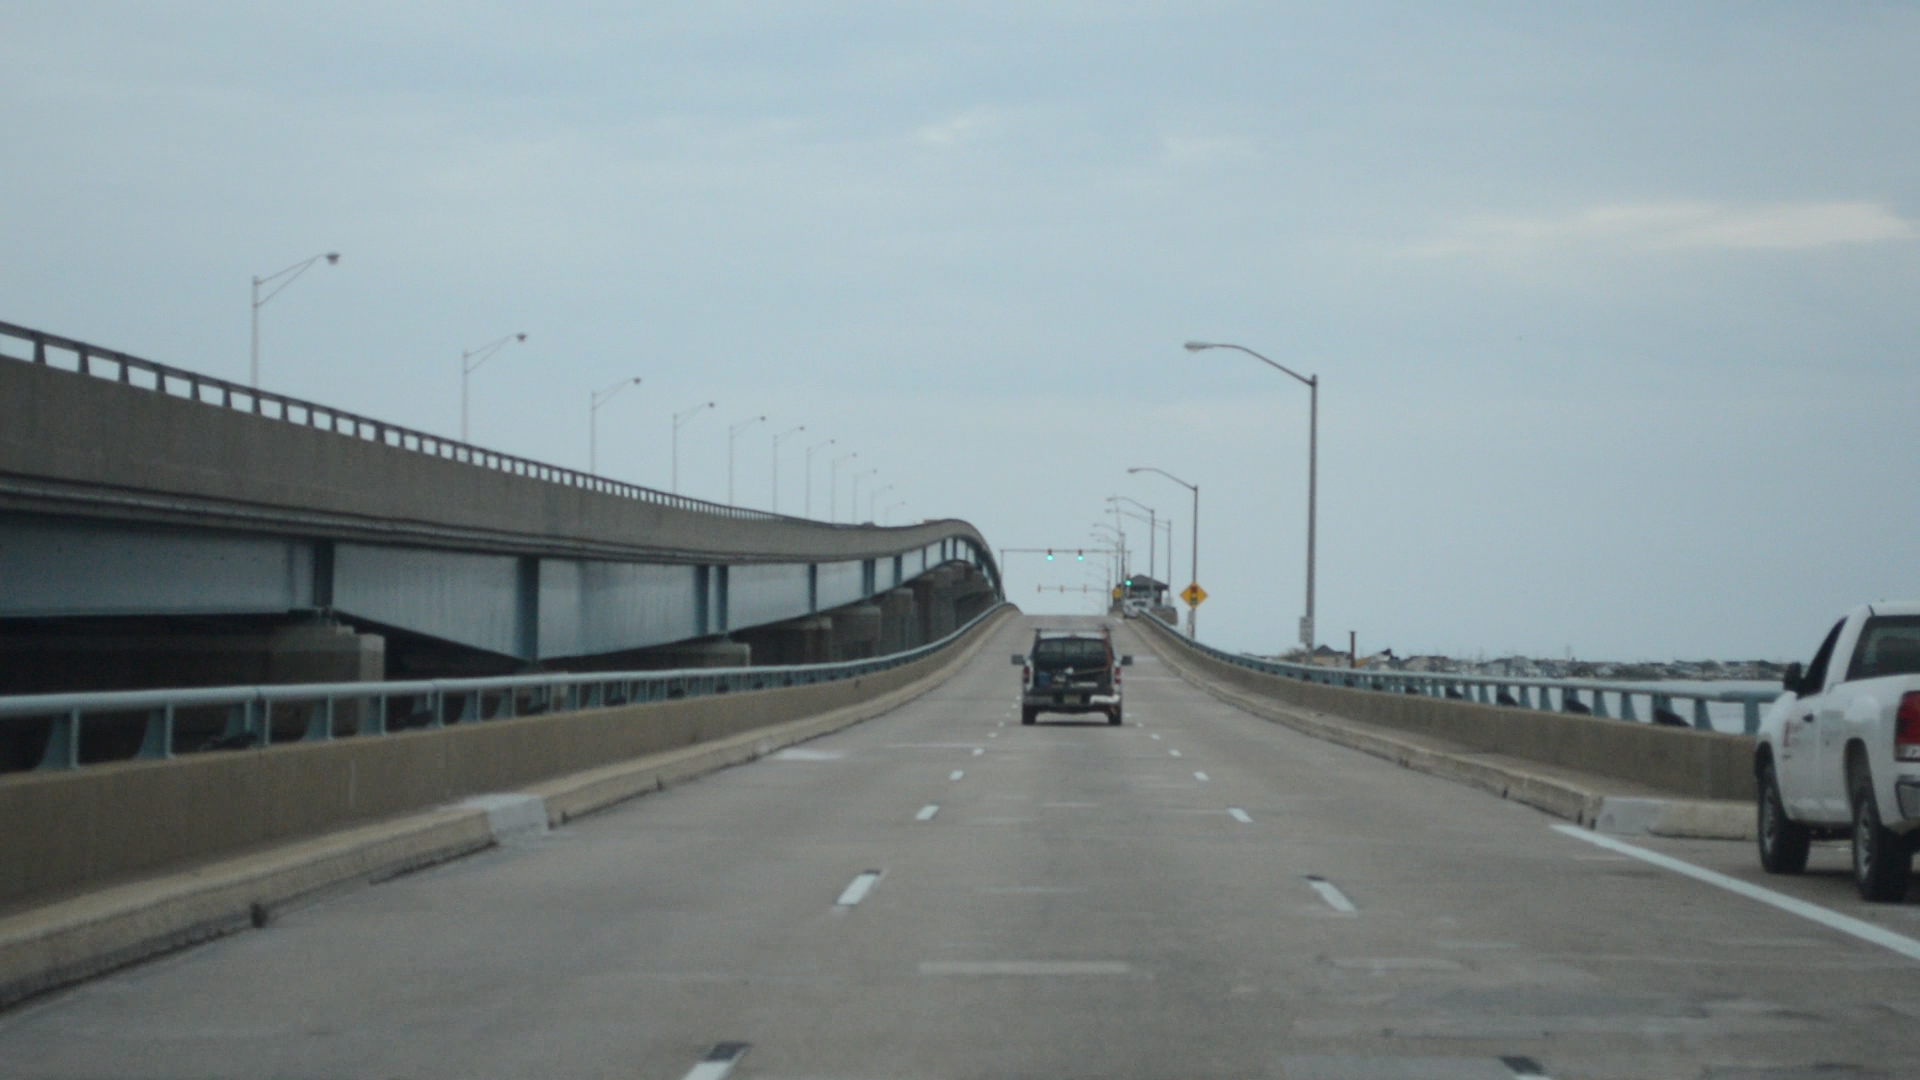 Traffic flows over the Thomas A. Mathis Bridge. (Photo: Daniel Nee)